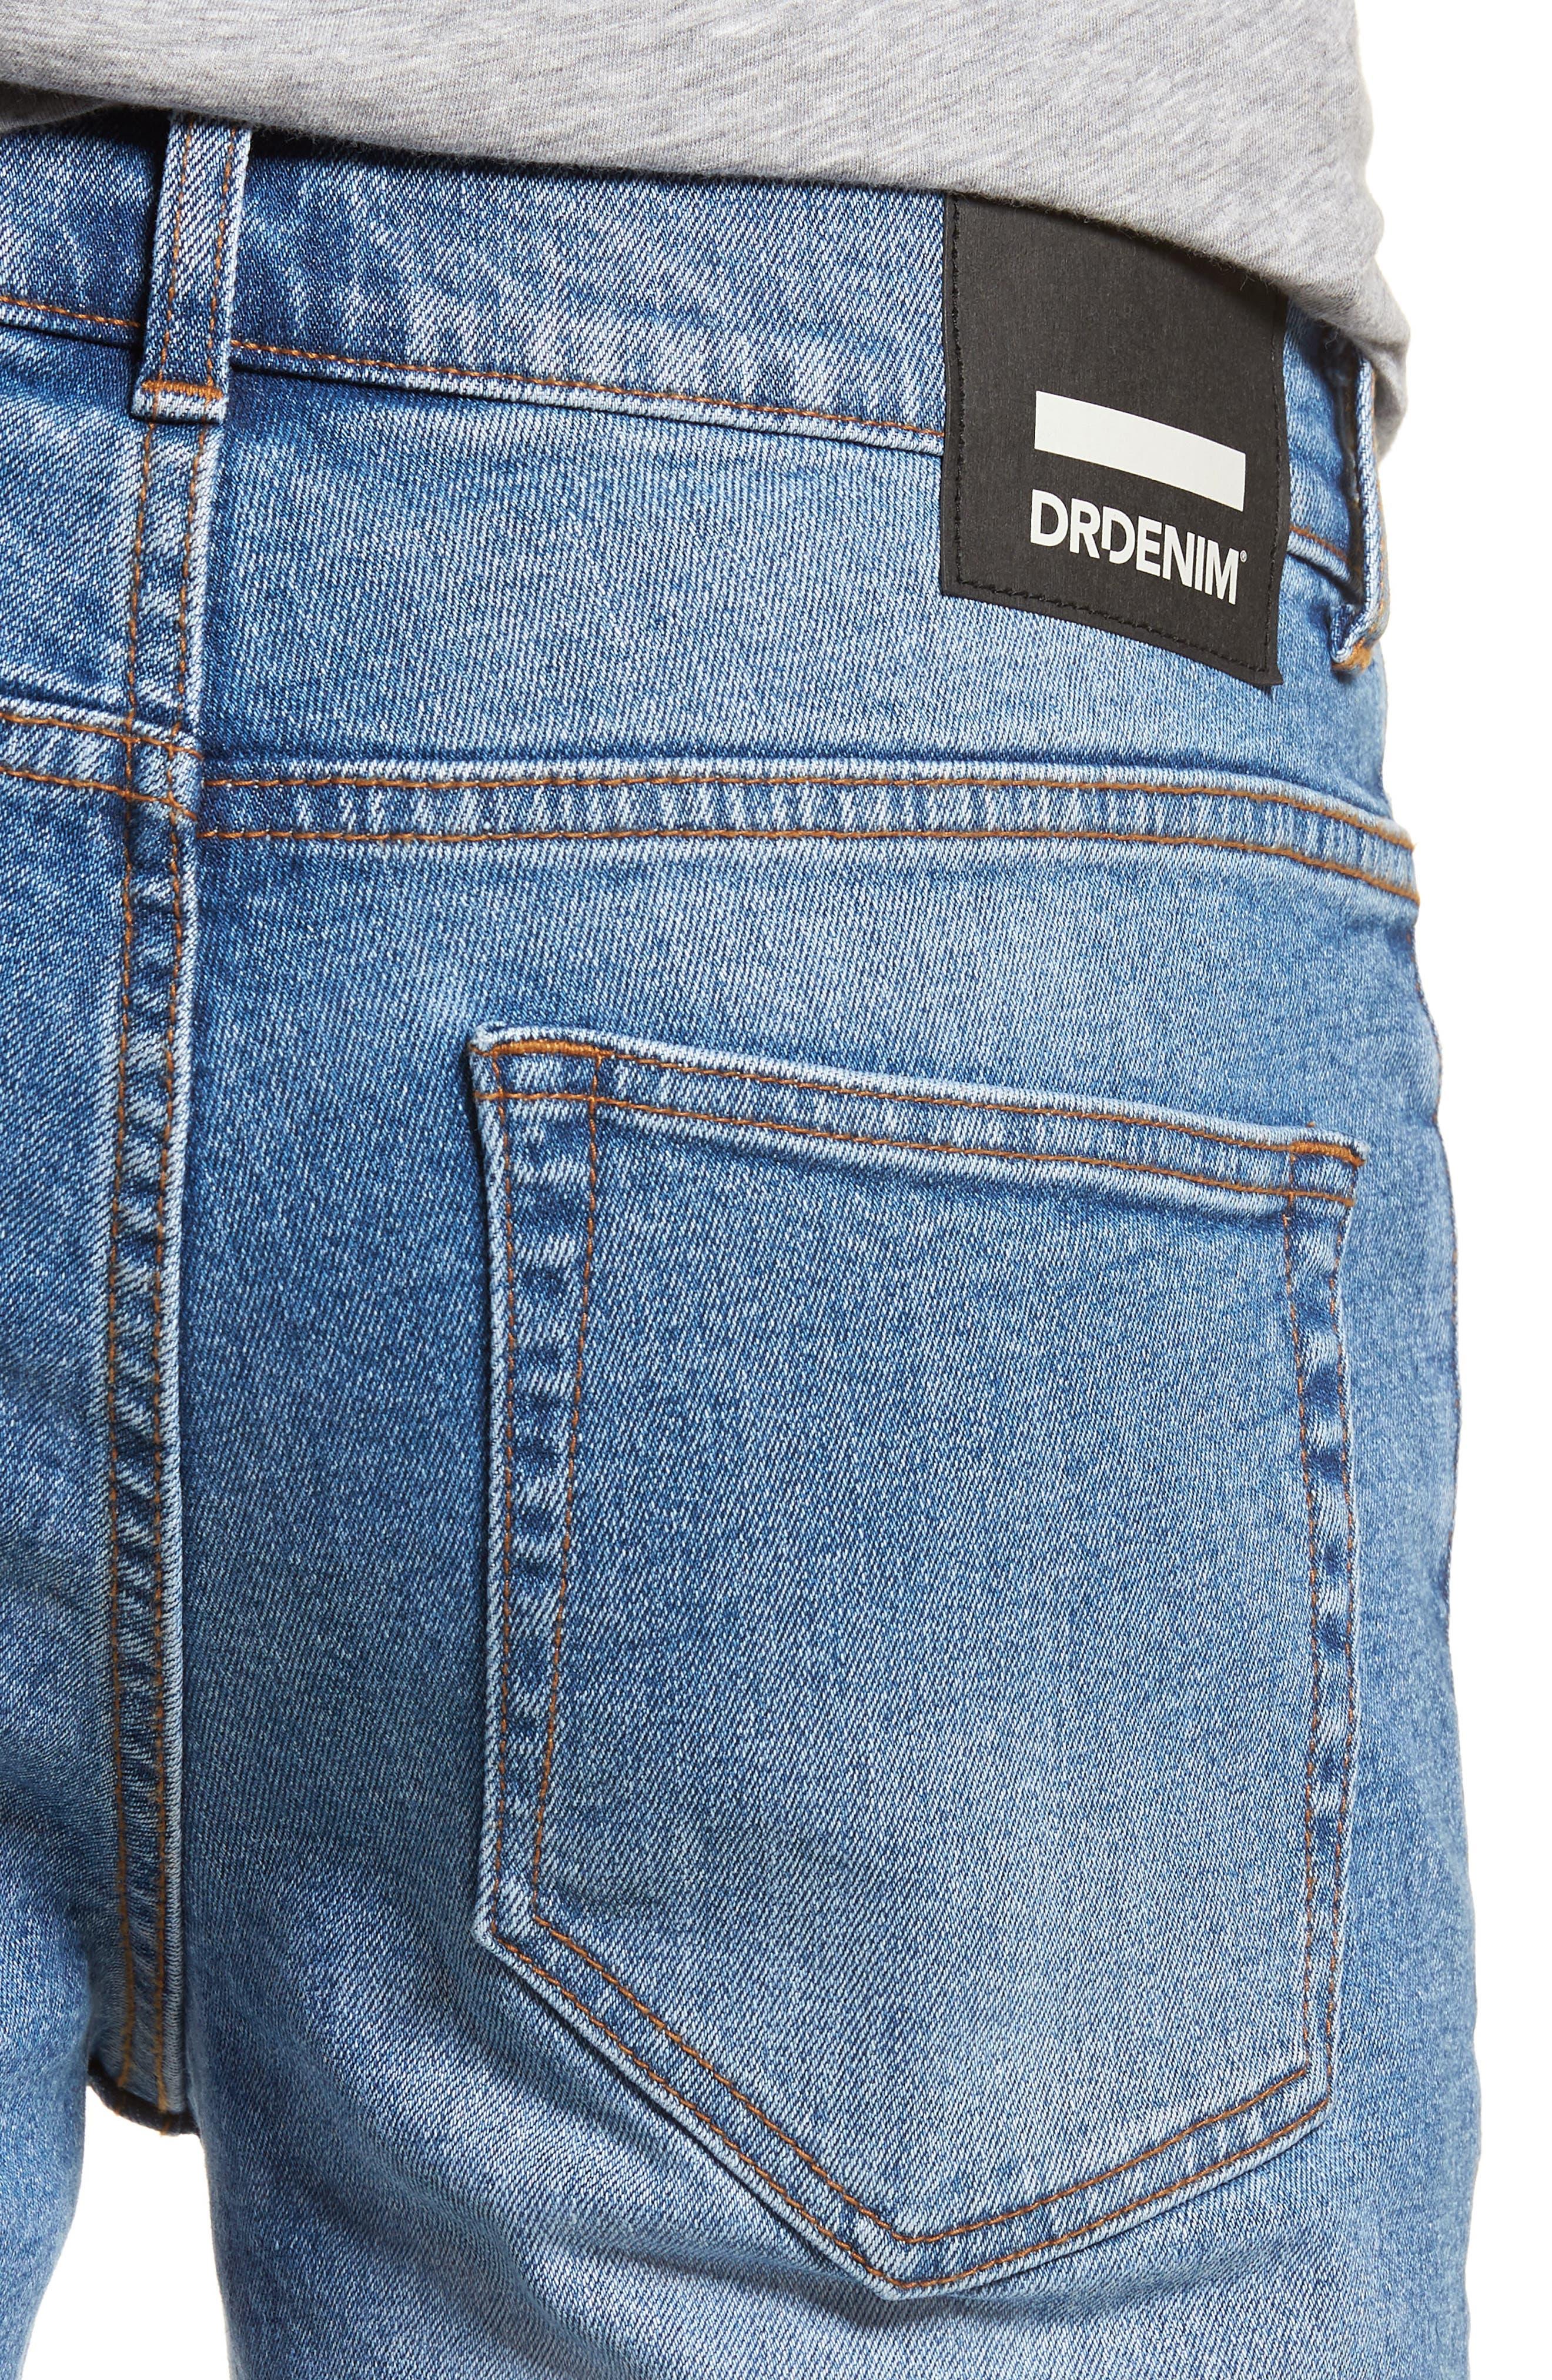 Clark Slim Straight Leg Jeans,                             Alternate thumbnail 4, color,                             Shaded Mid Blue